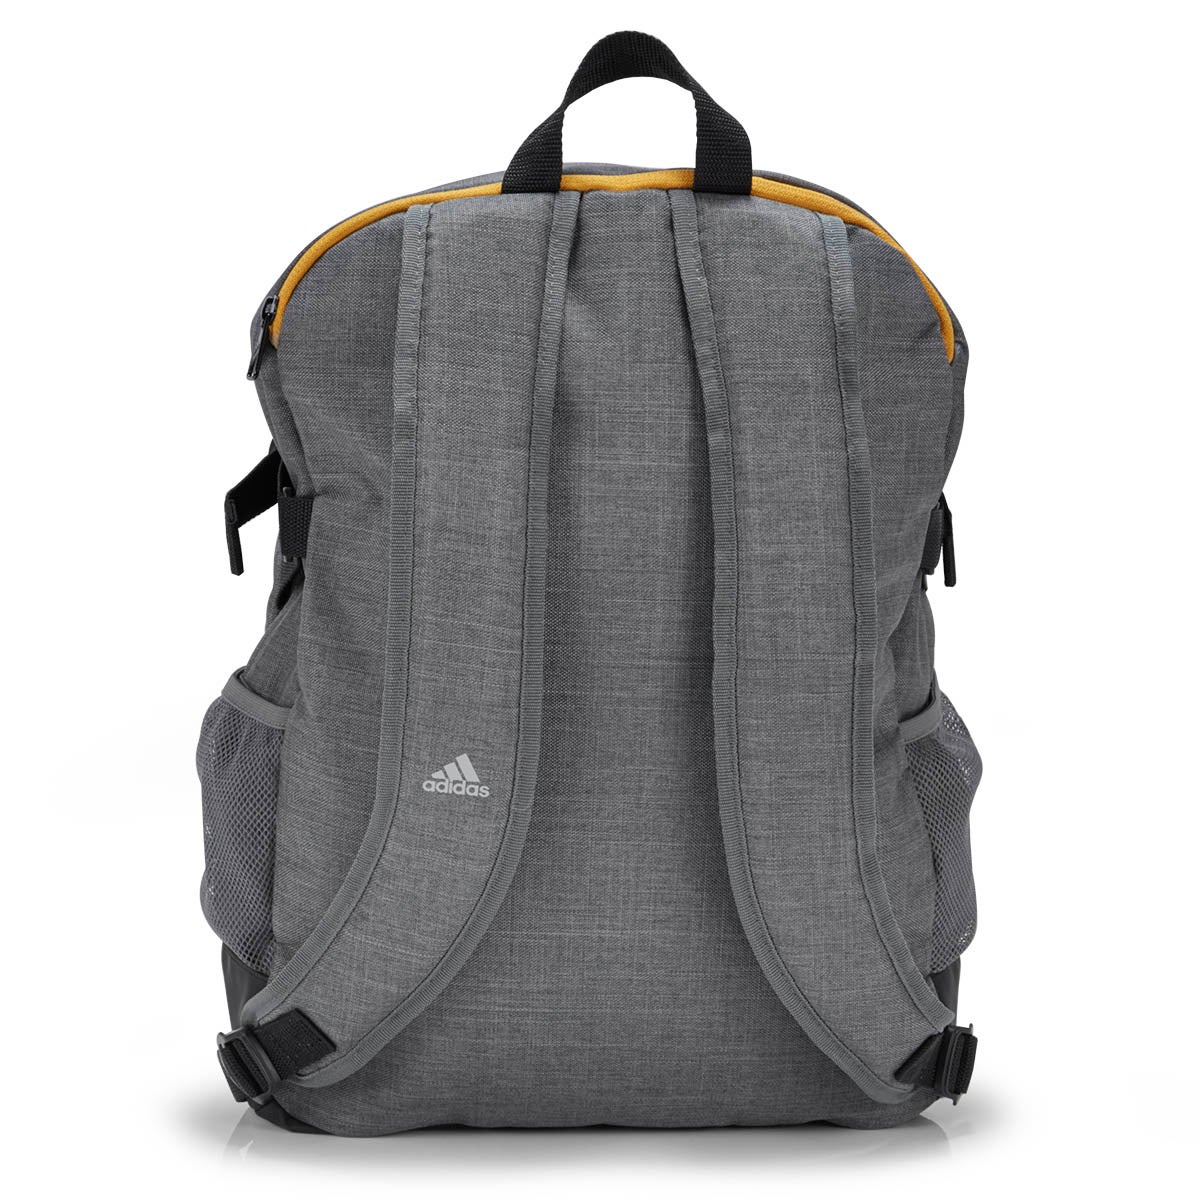 Adidas BP Power IV MF grey backpack